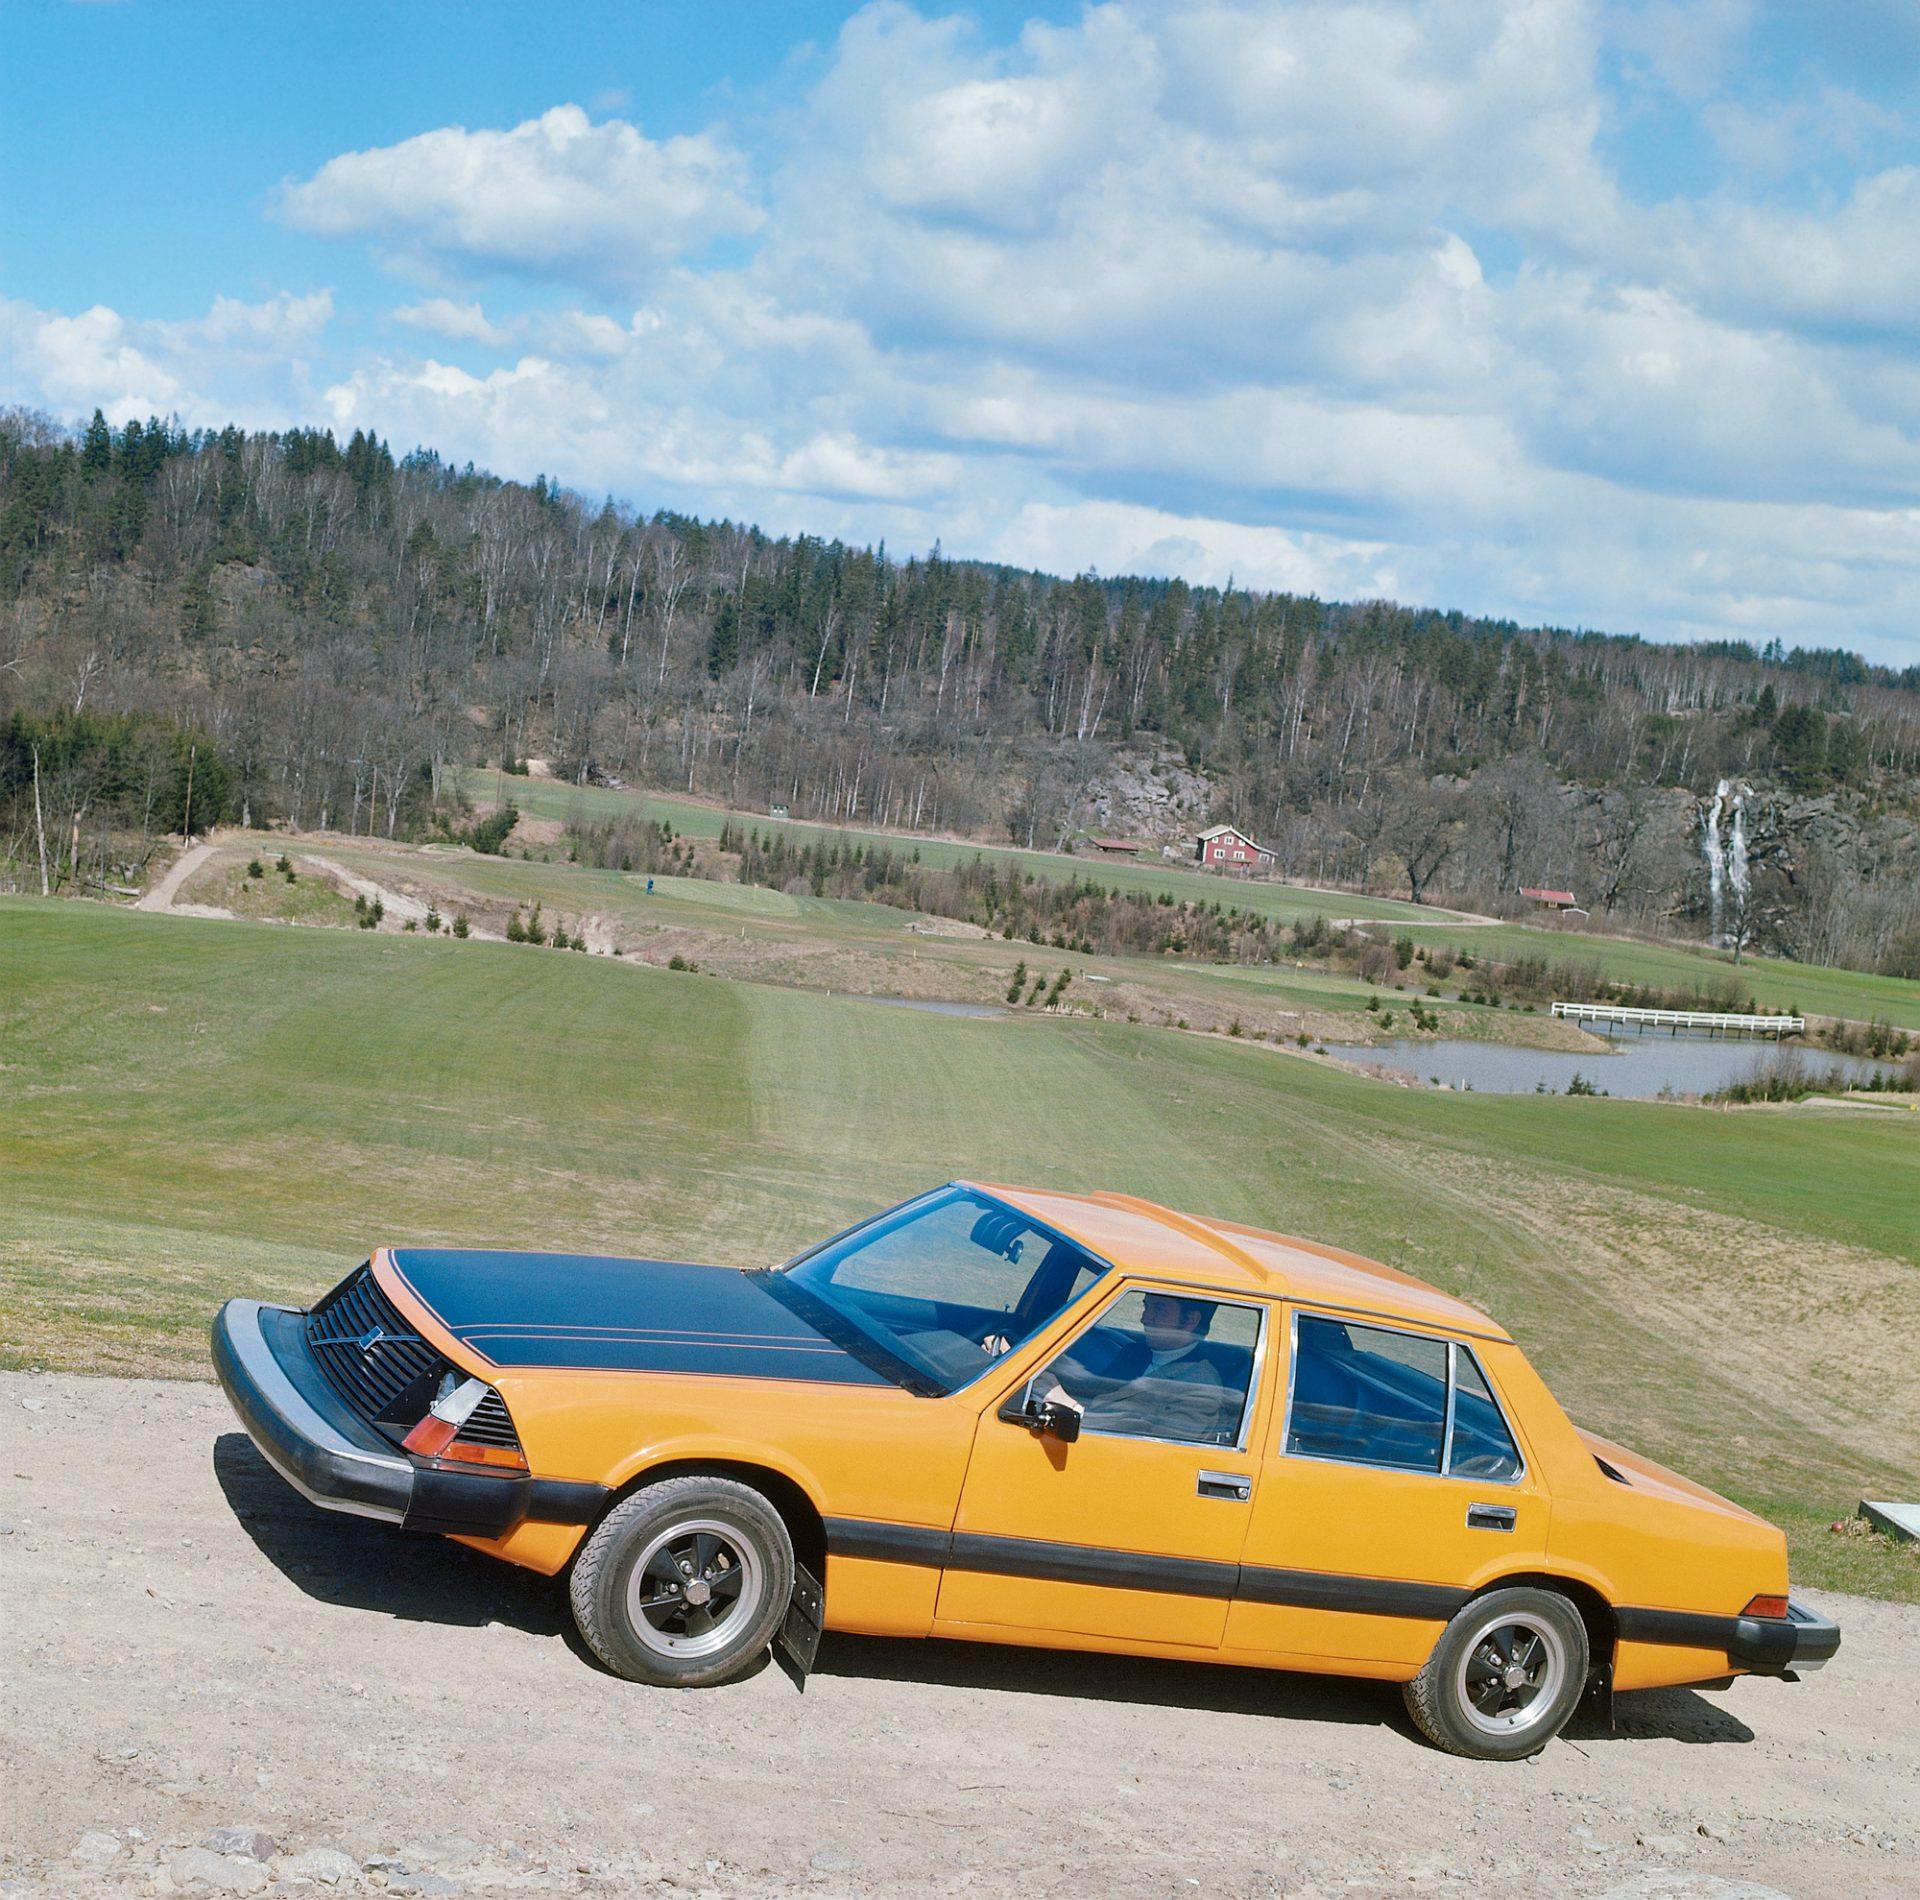 Volvo_VESC_Concept_Car_20583